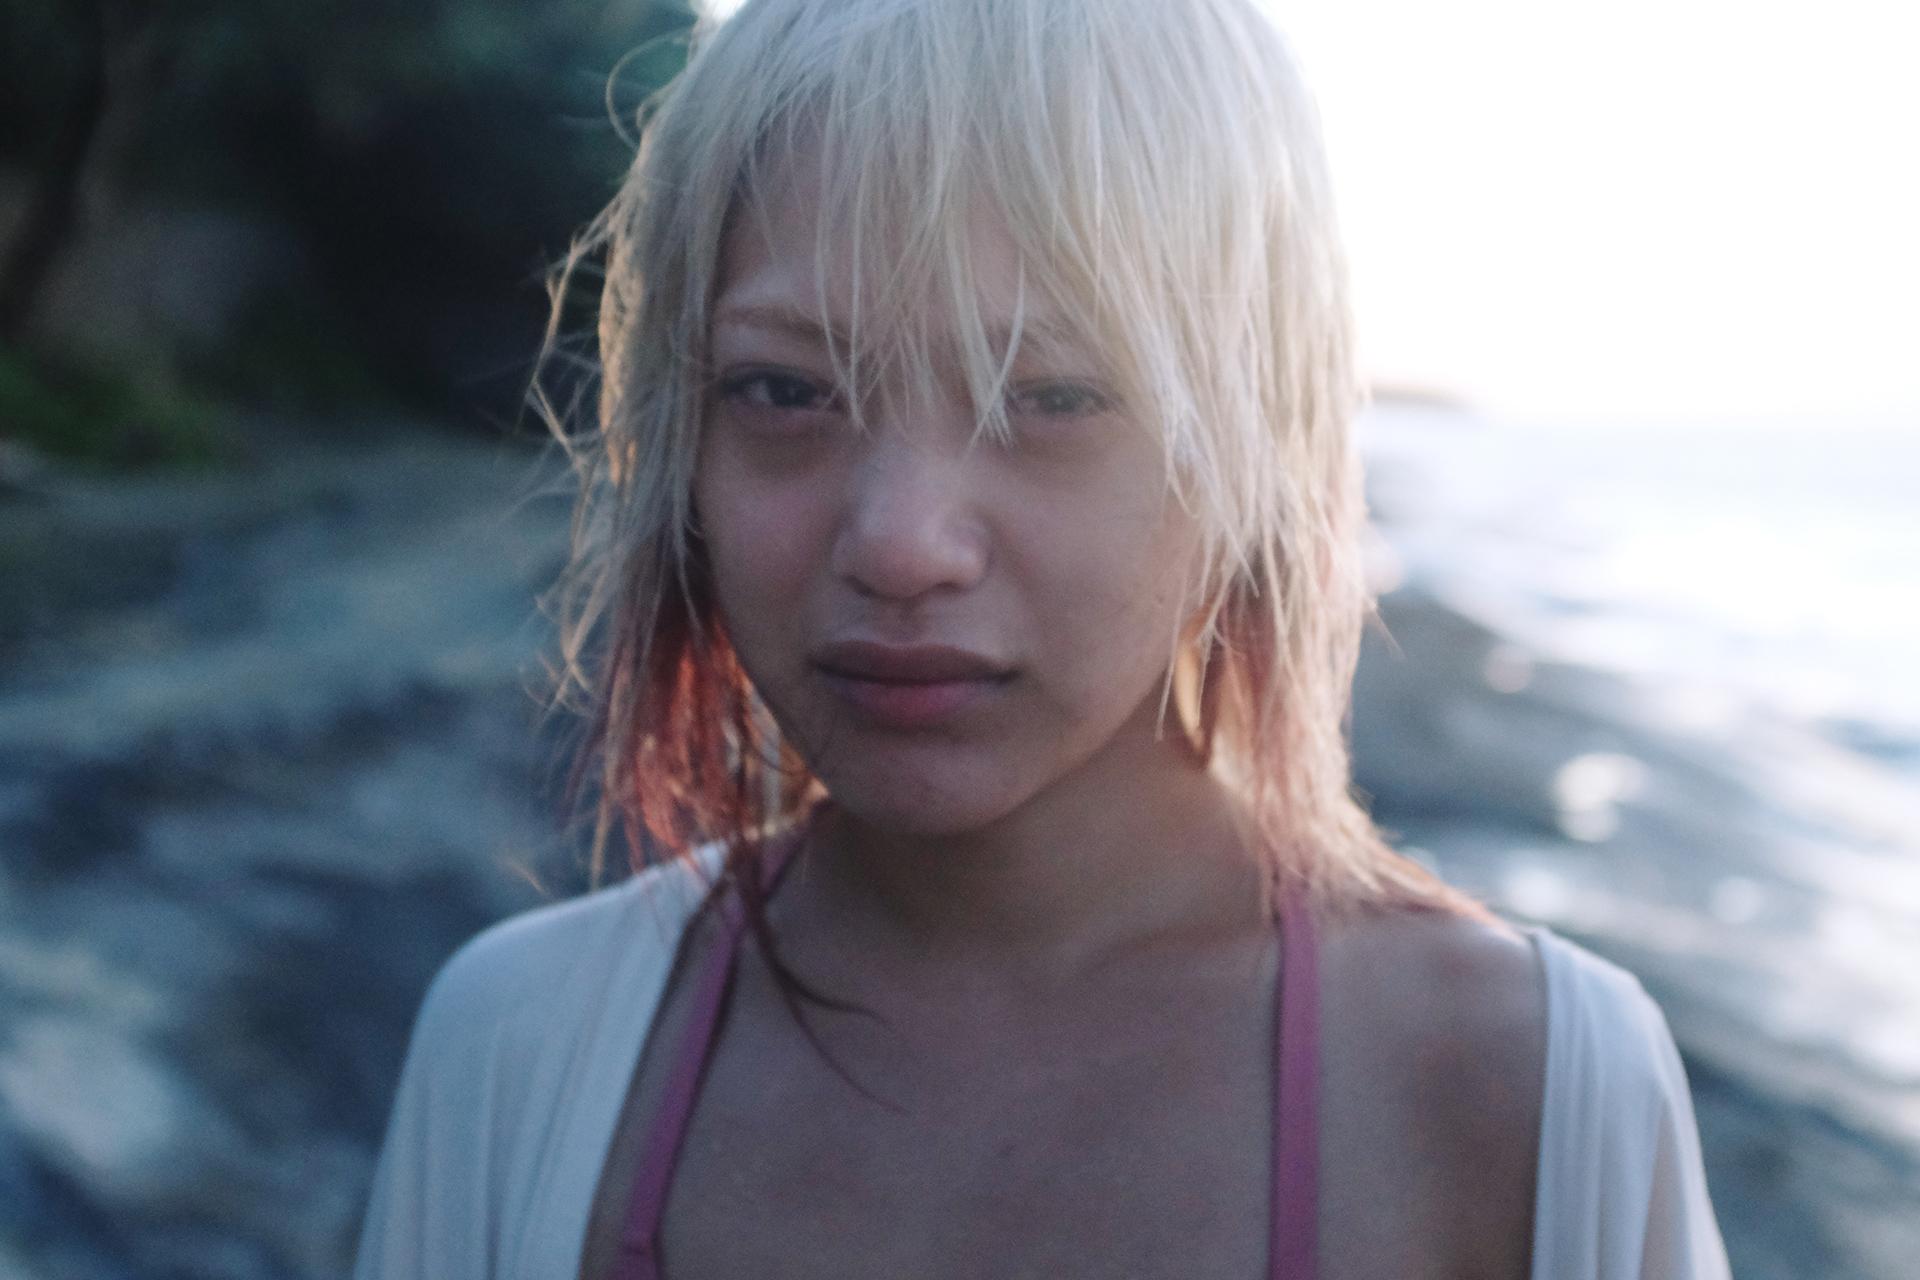 相澤義和 | Aizawa Yoshikazu